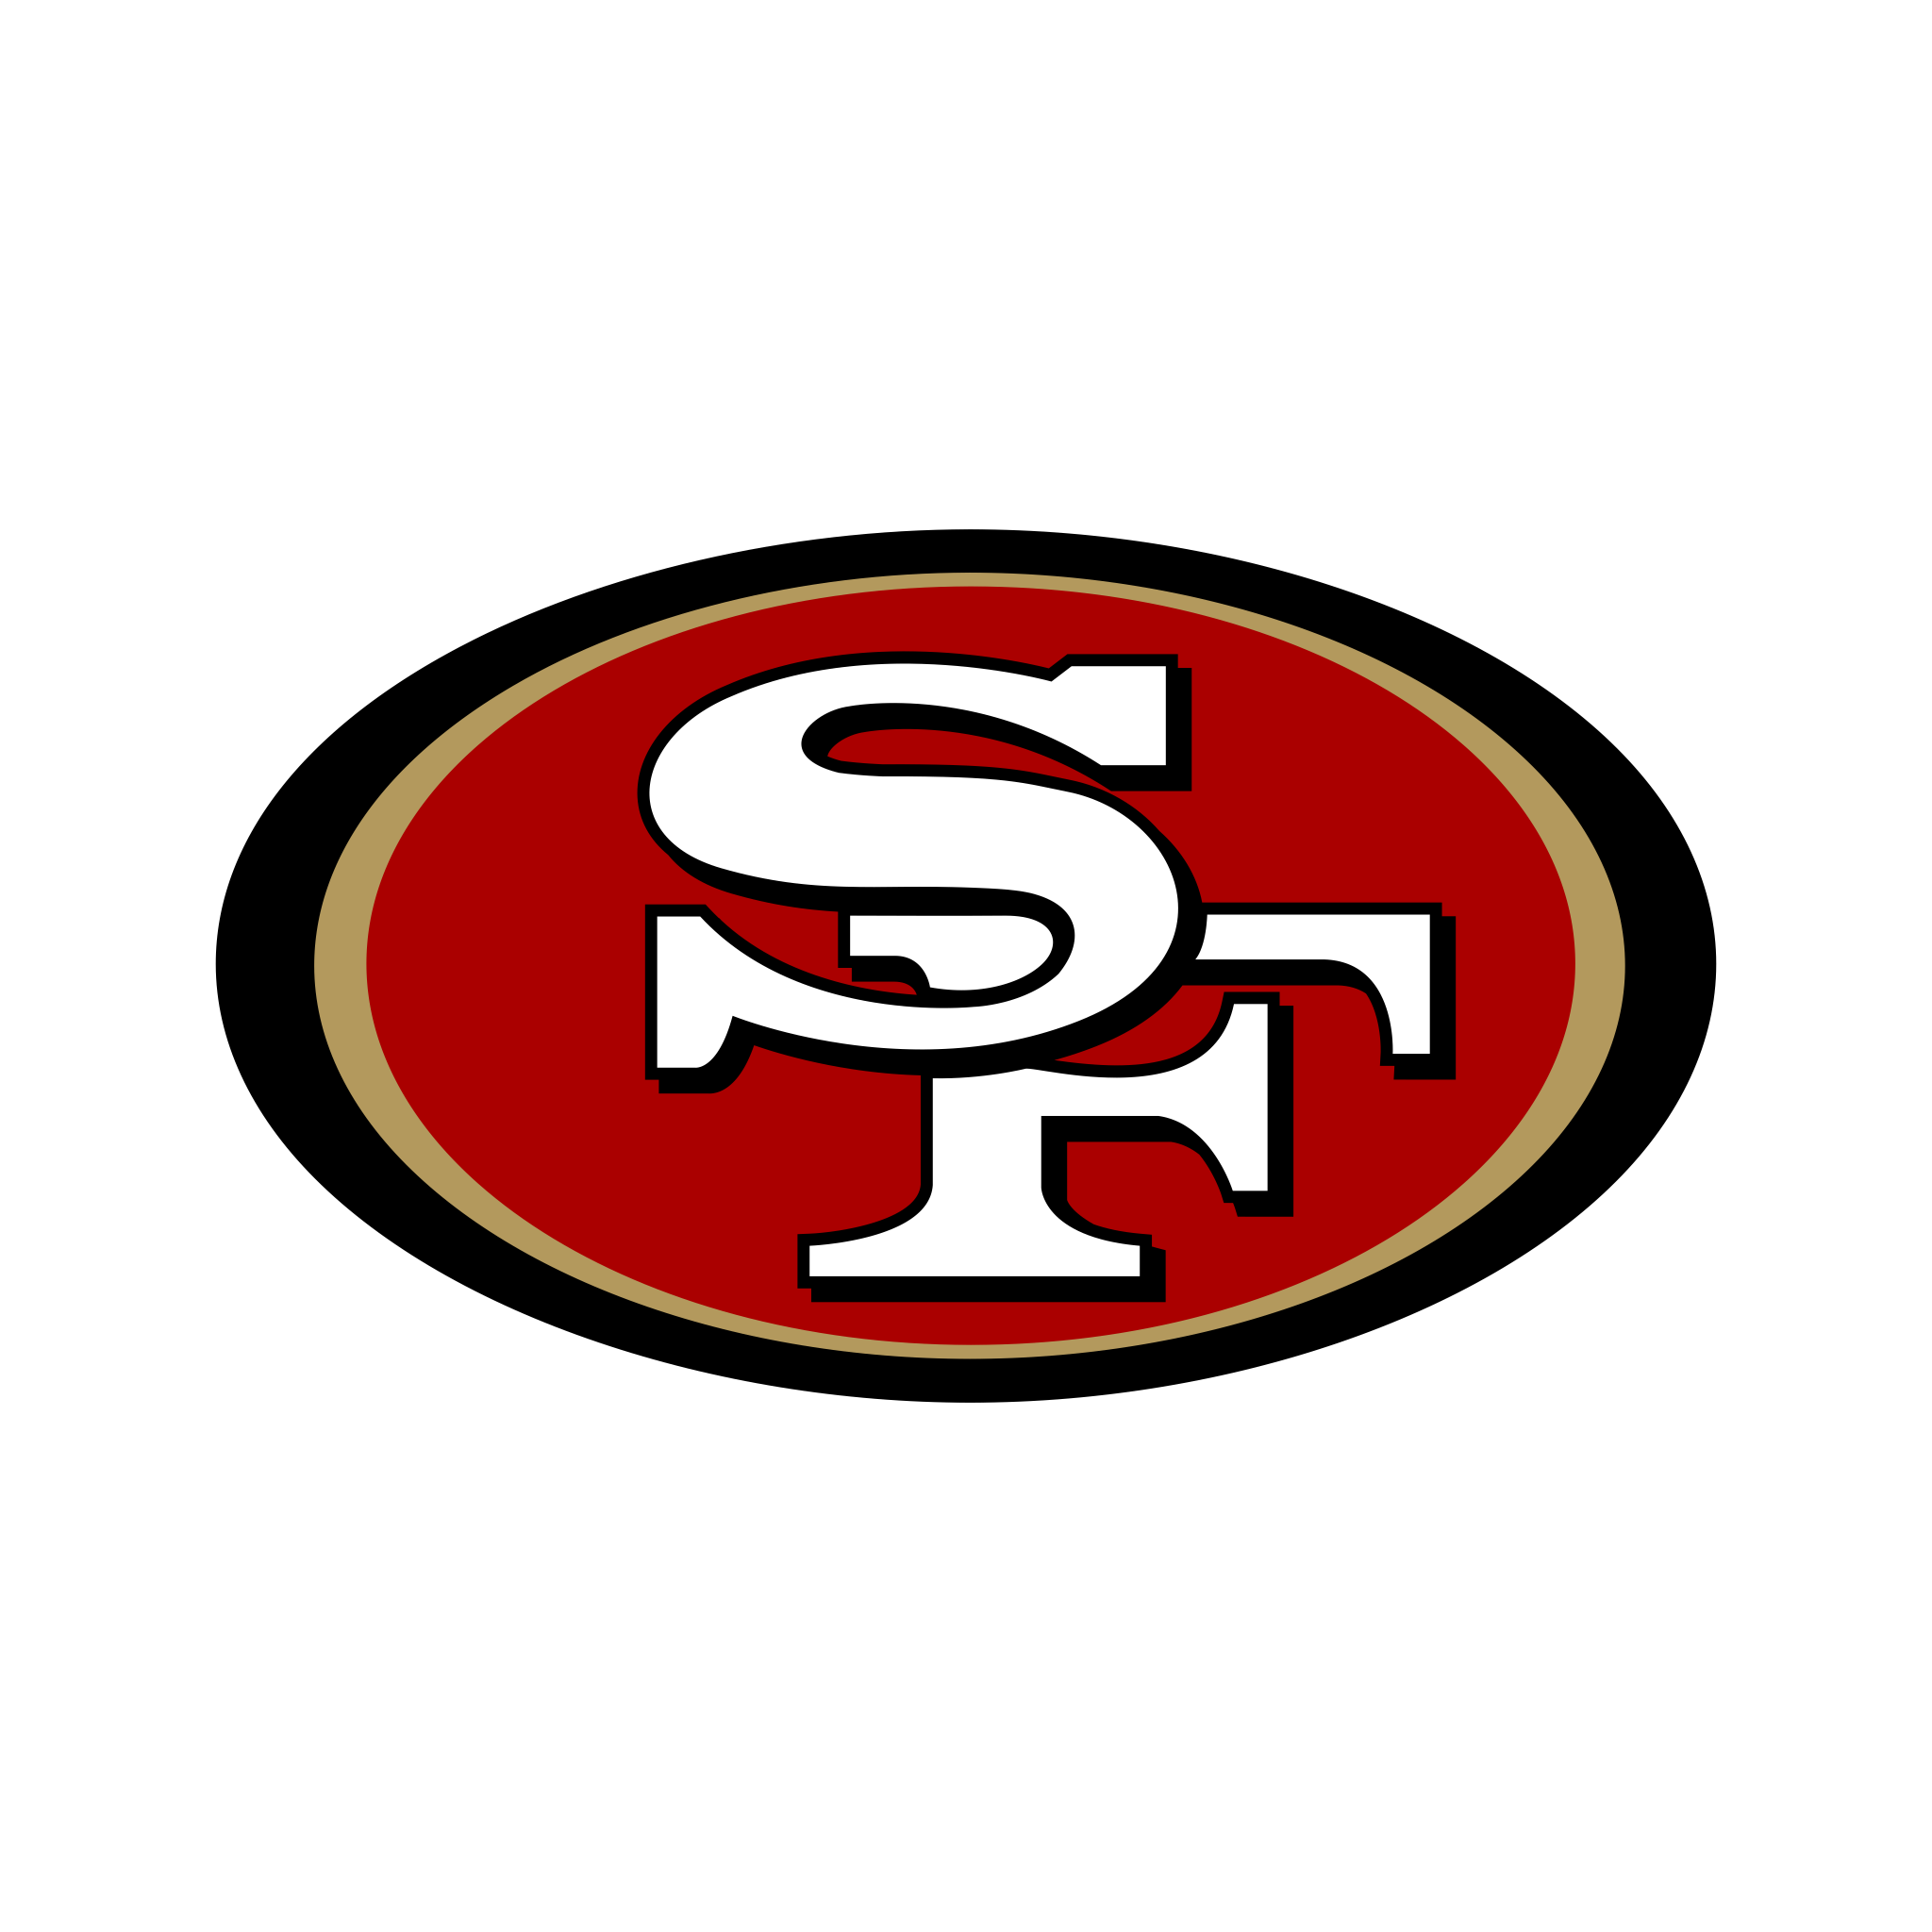 San Francisco 49ers Logo - PNG e Vetor - Download de Logo